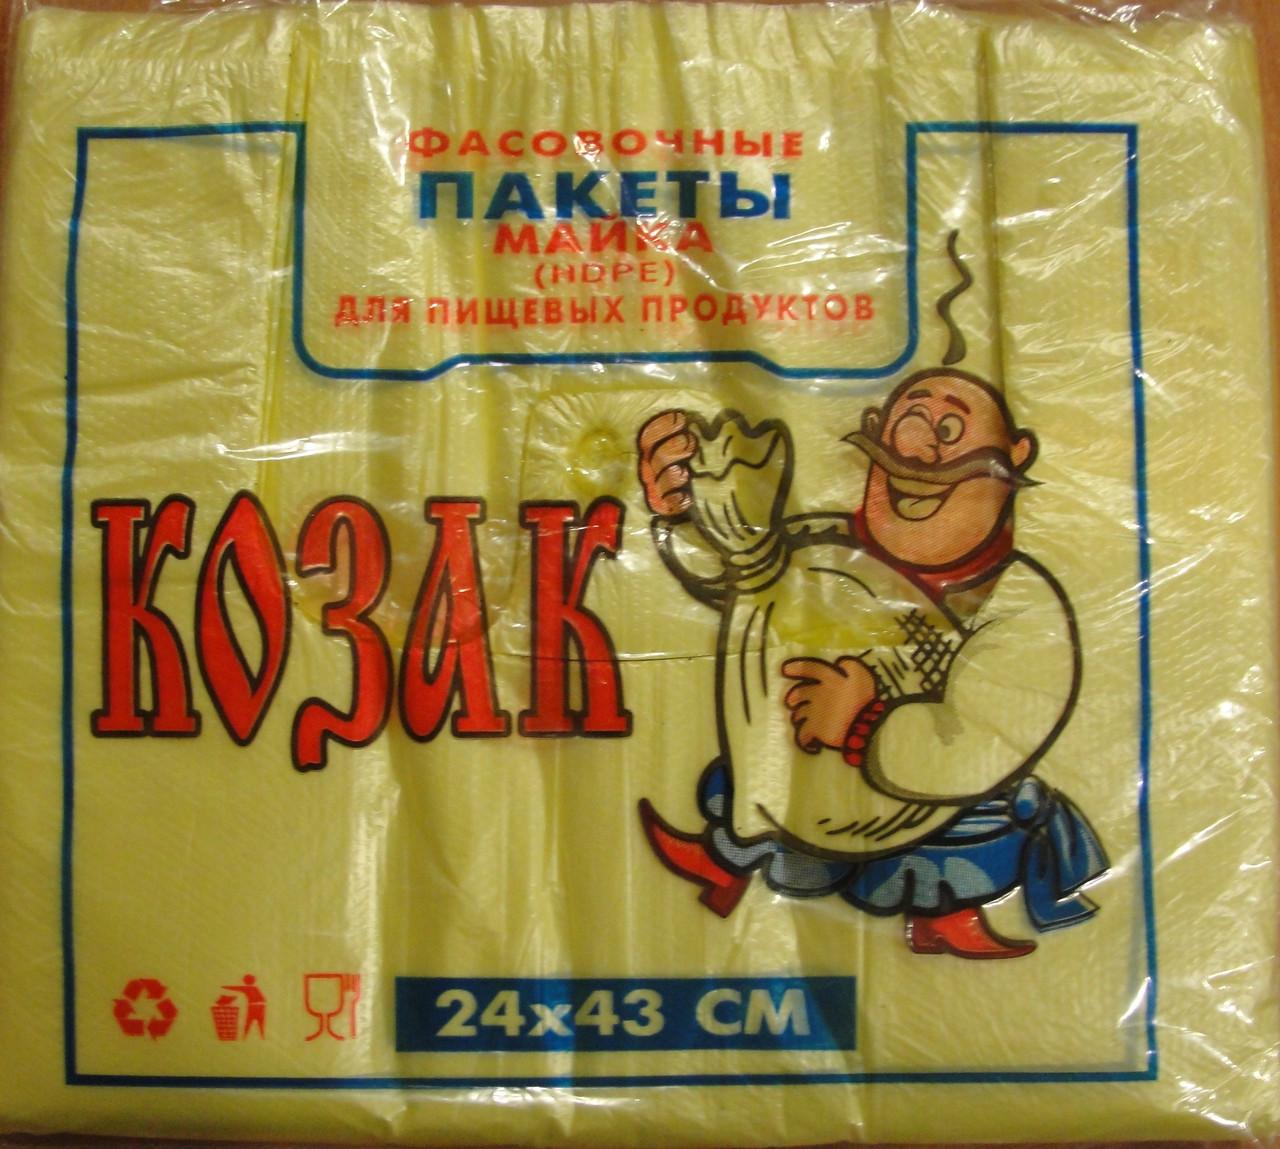 Пакет майка козак 24*43 50уп/меш